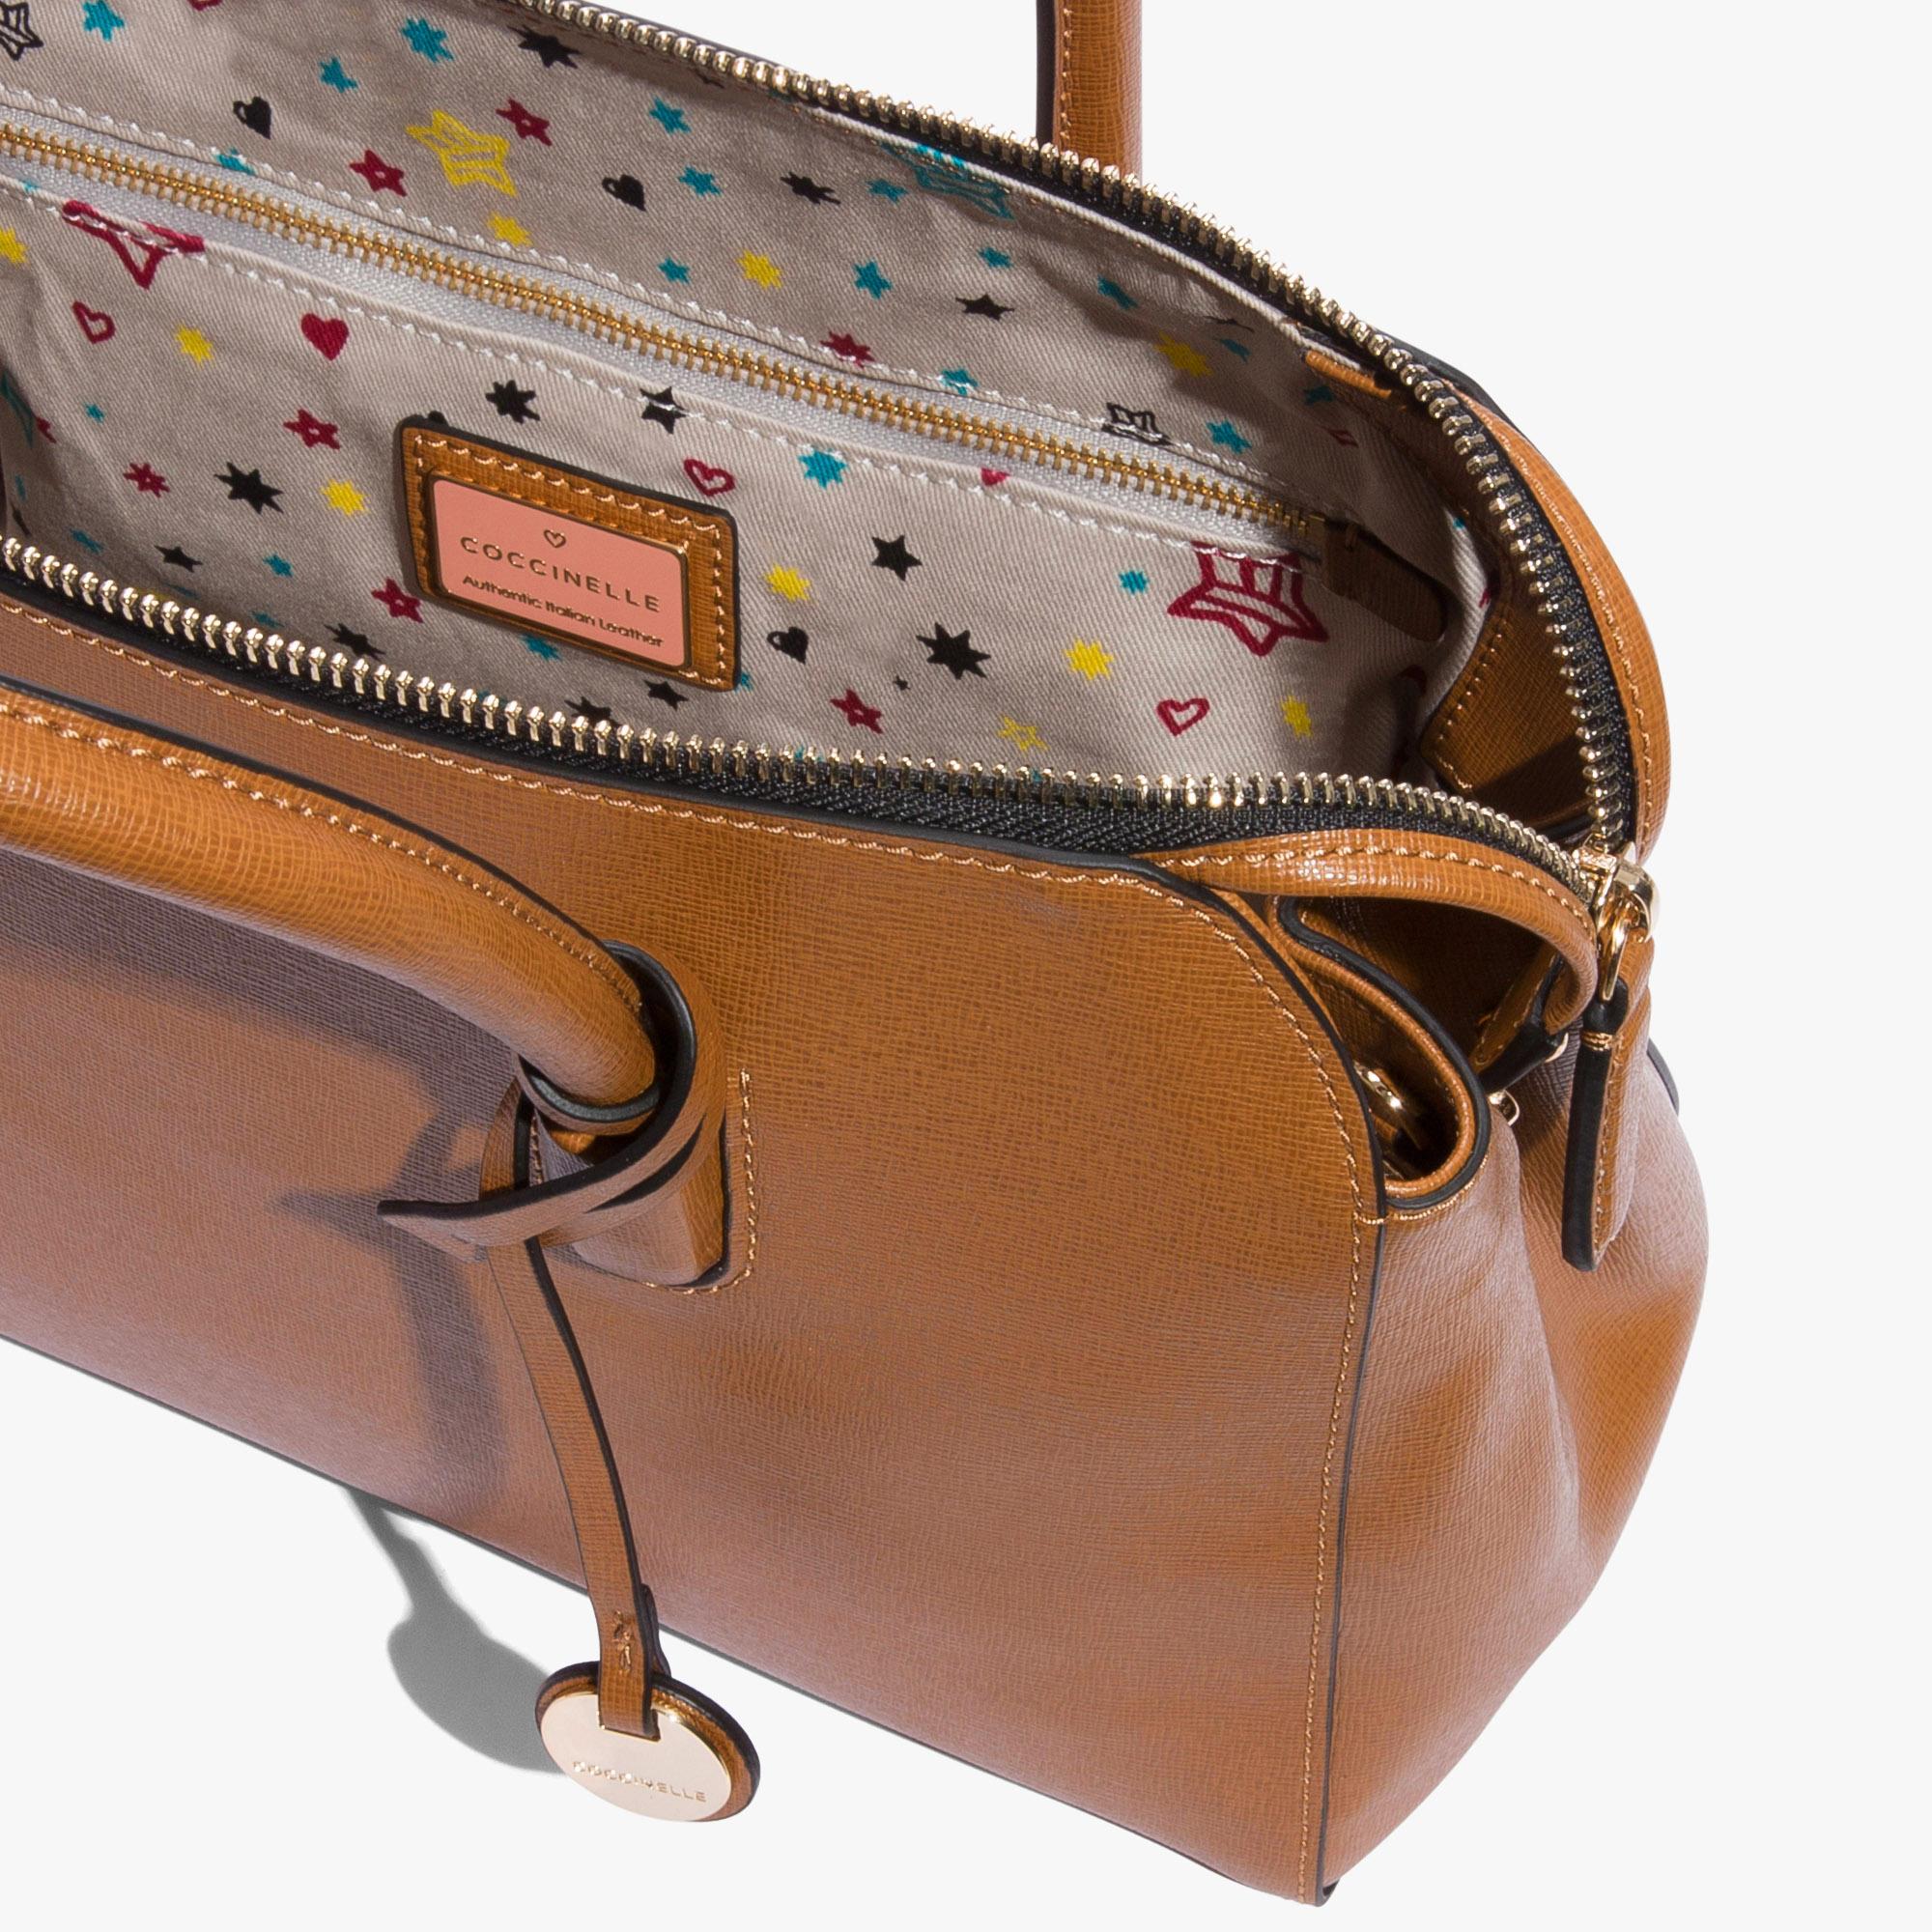 Clementine saffiano handbag